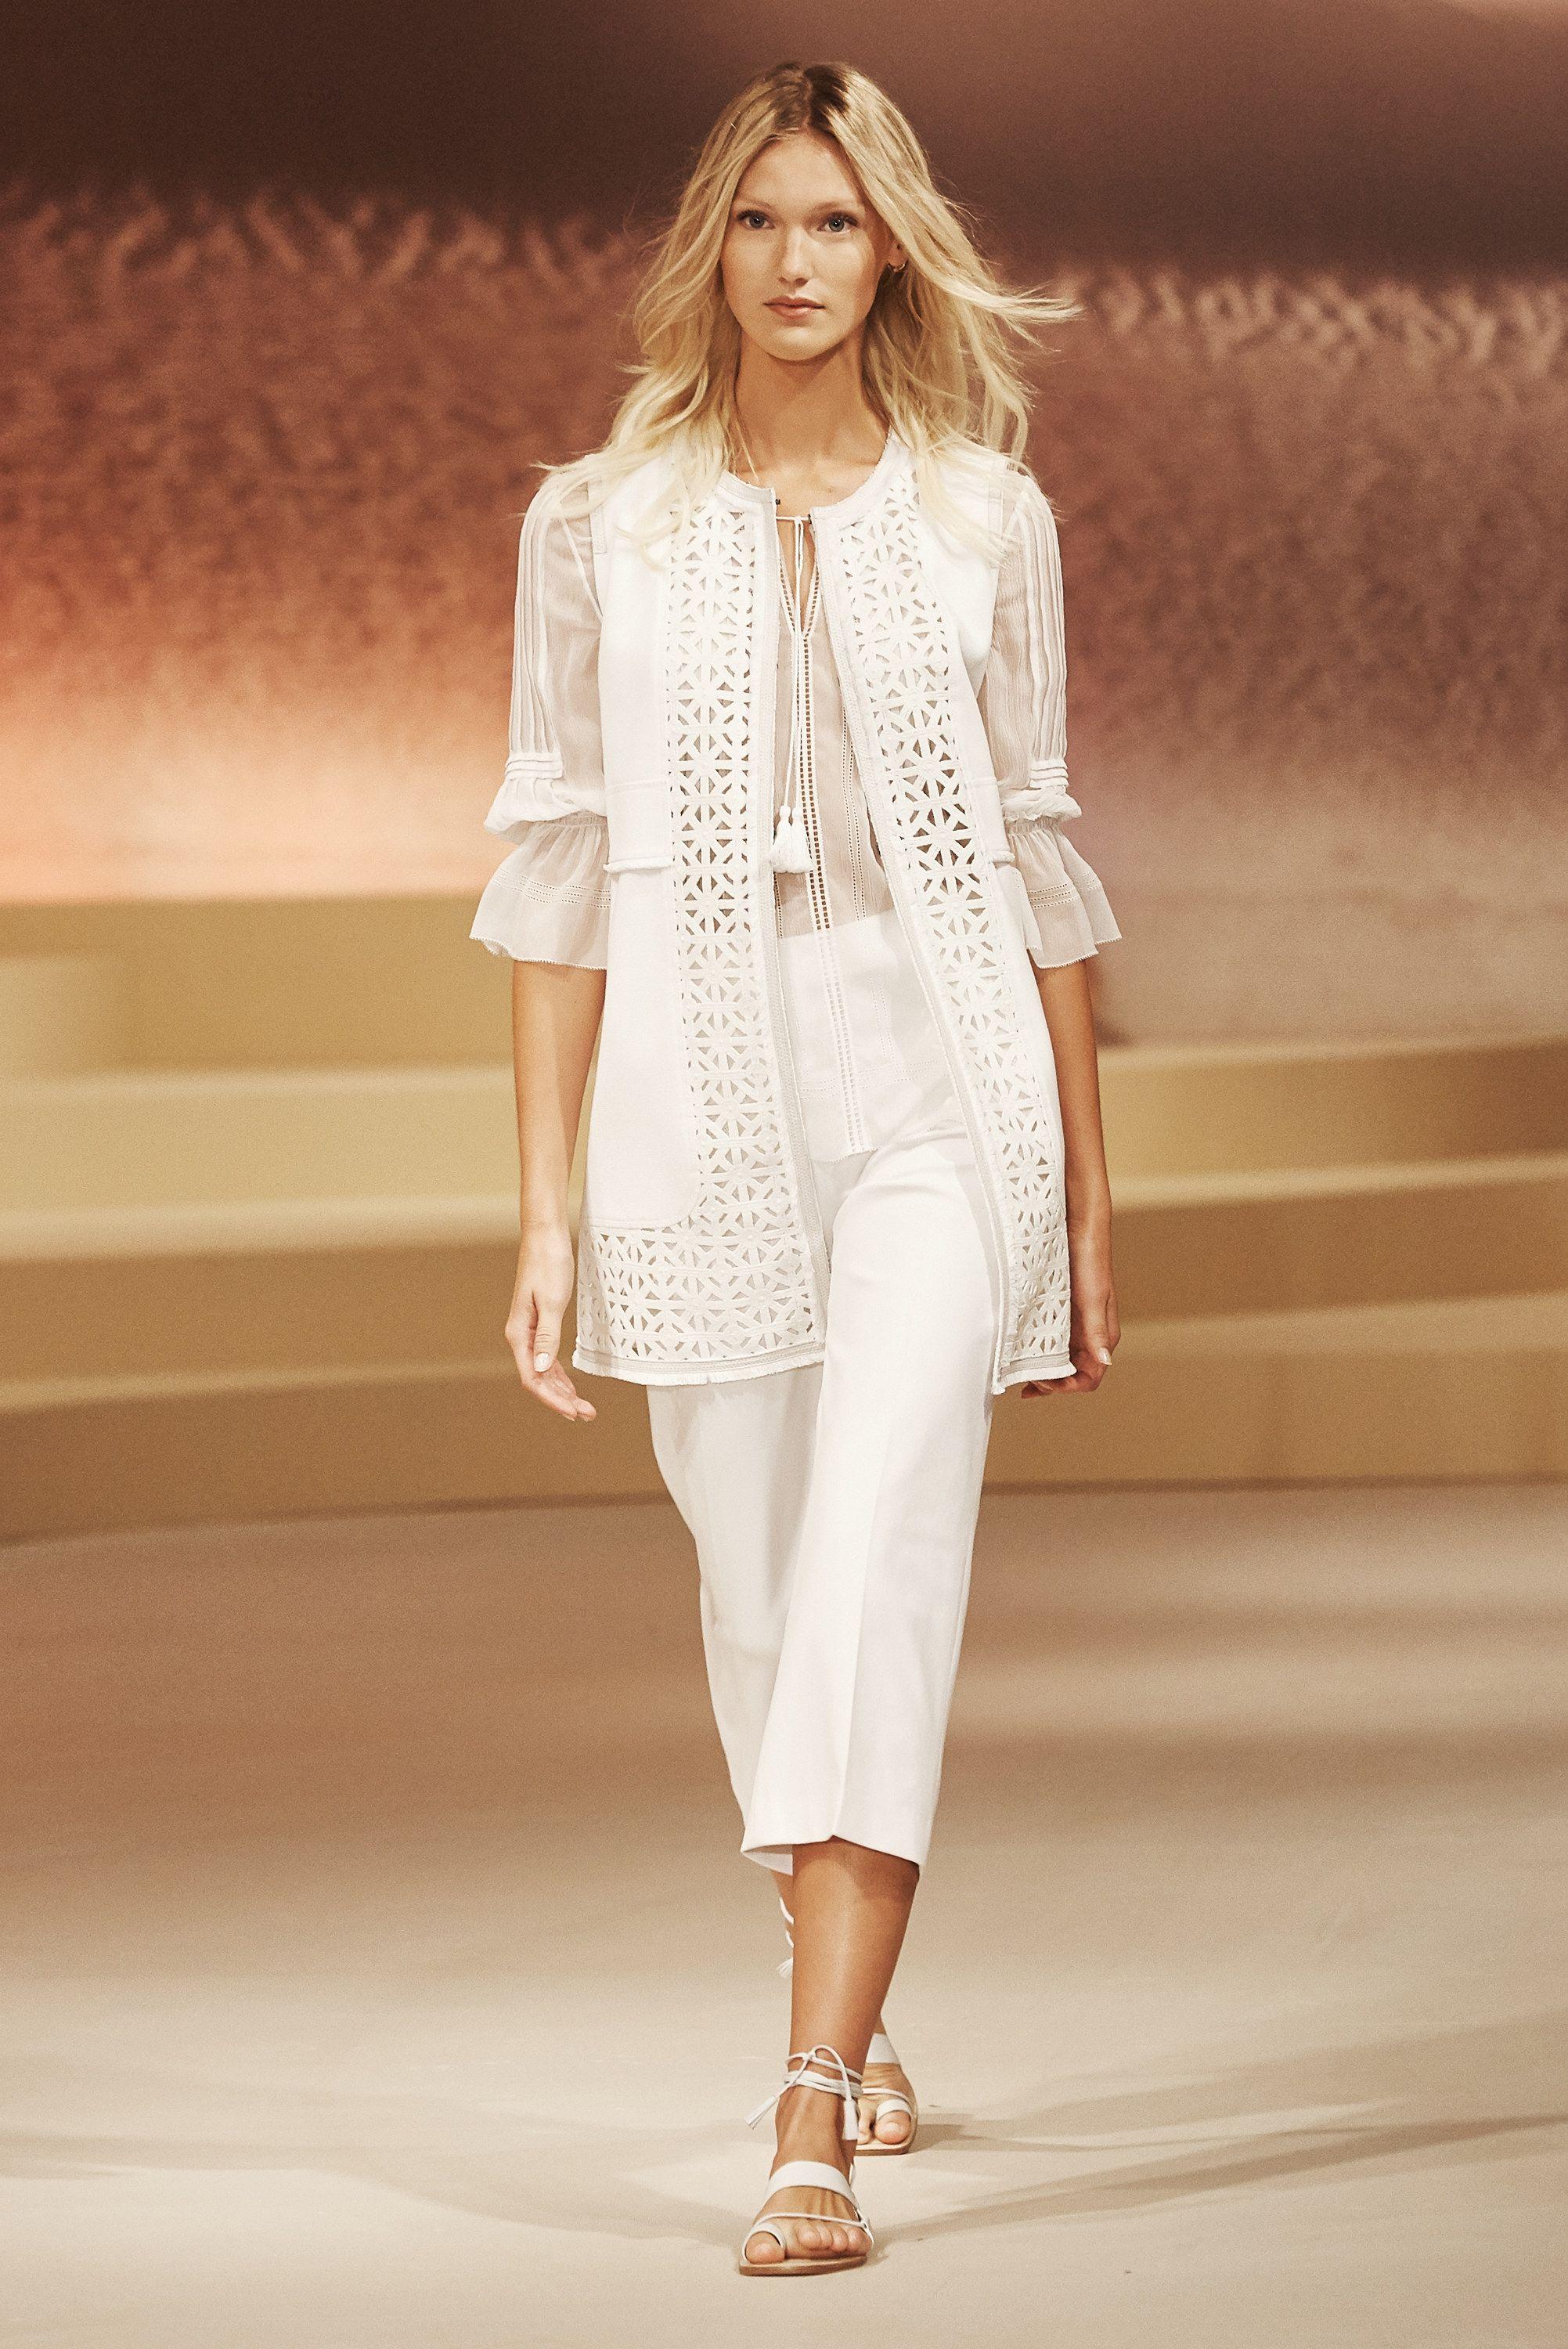 Elie Tahari SpringSummer 2014 RTW – New York Fashion Week